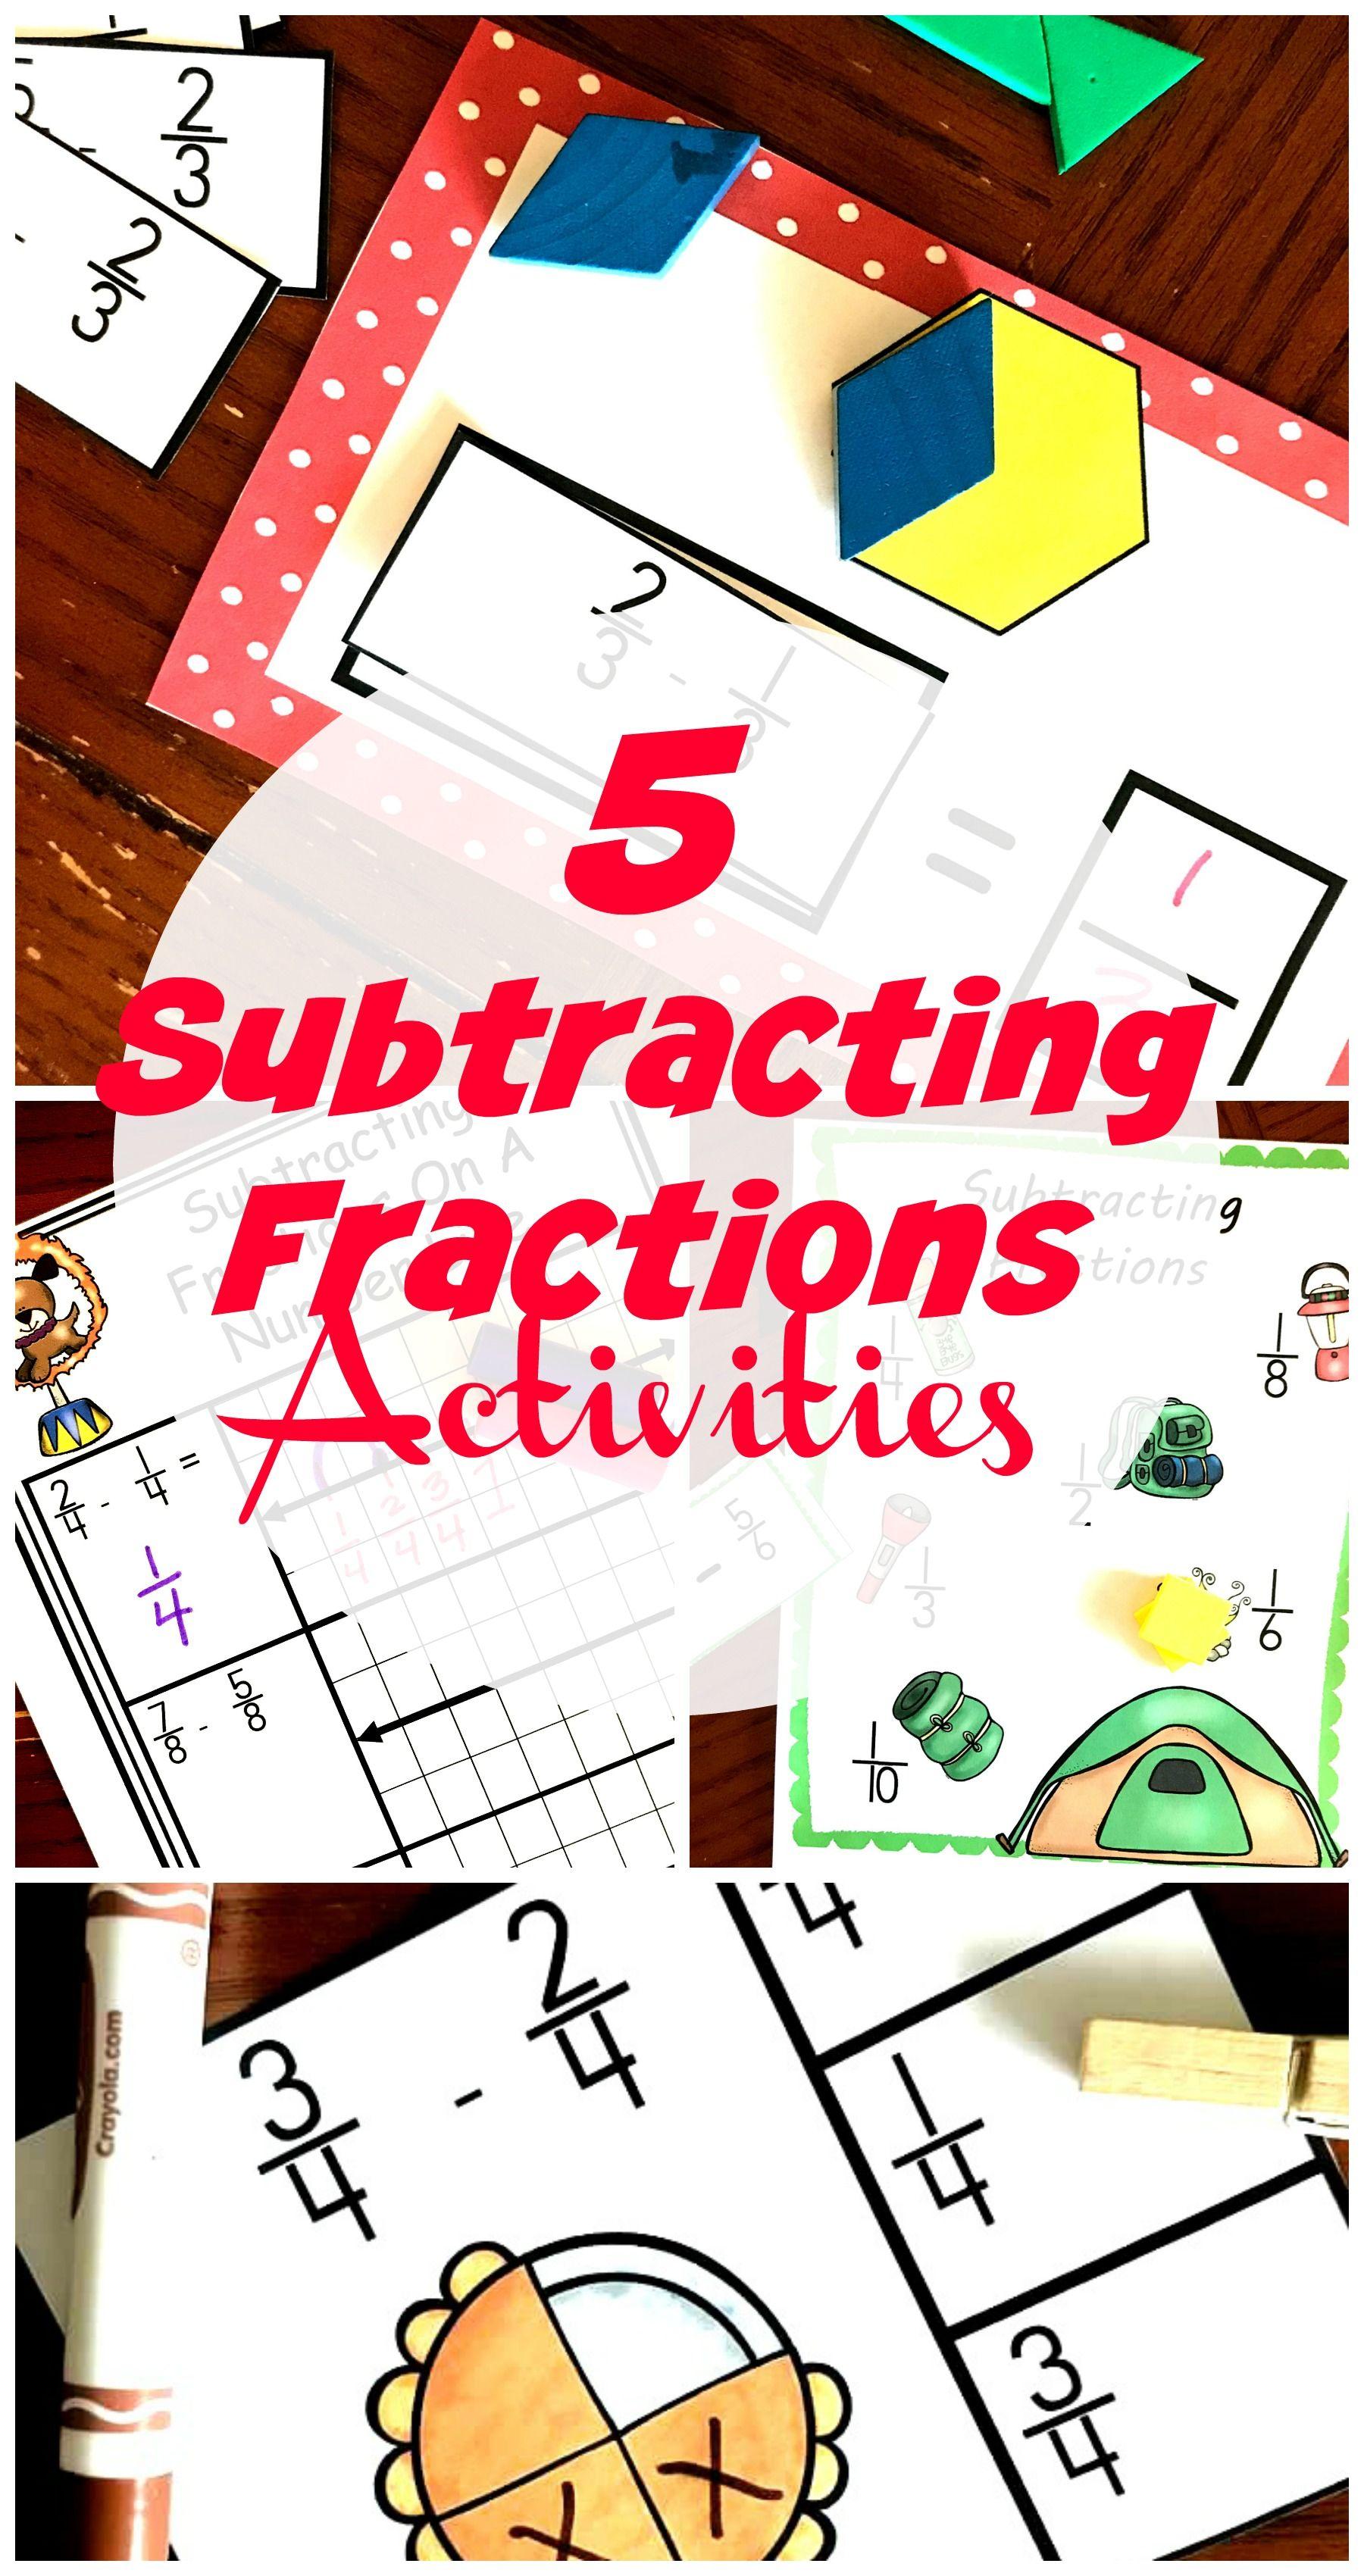 5 Subtracting Fractions With Common Denominators Activites